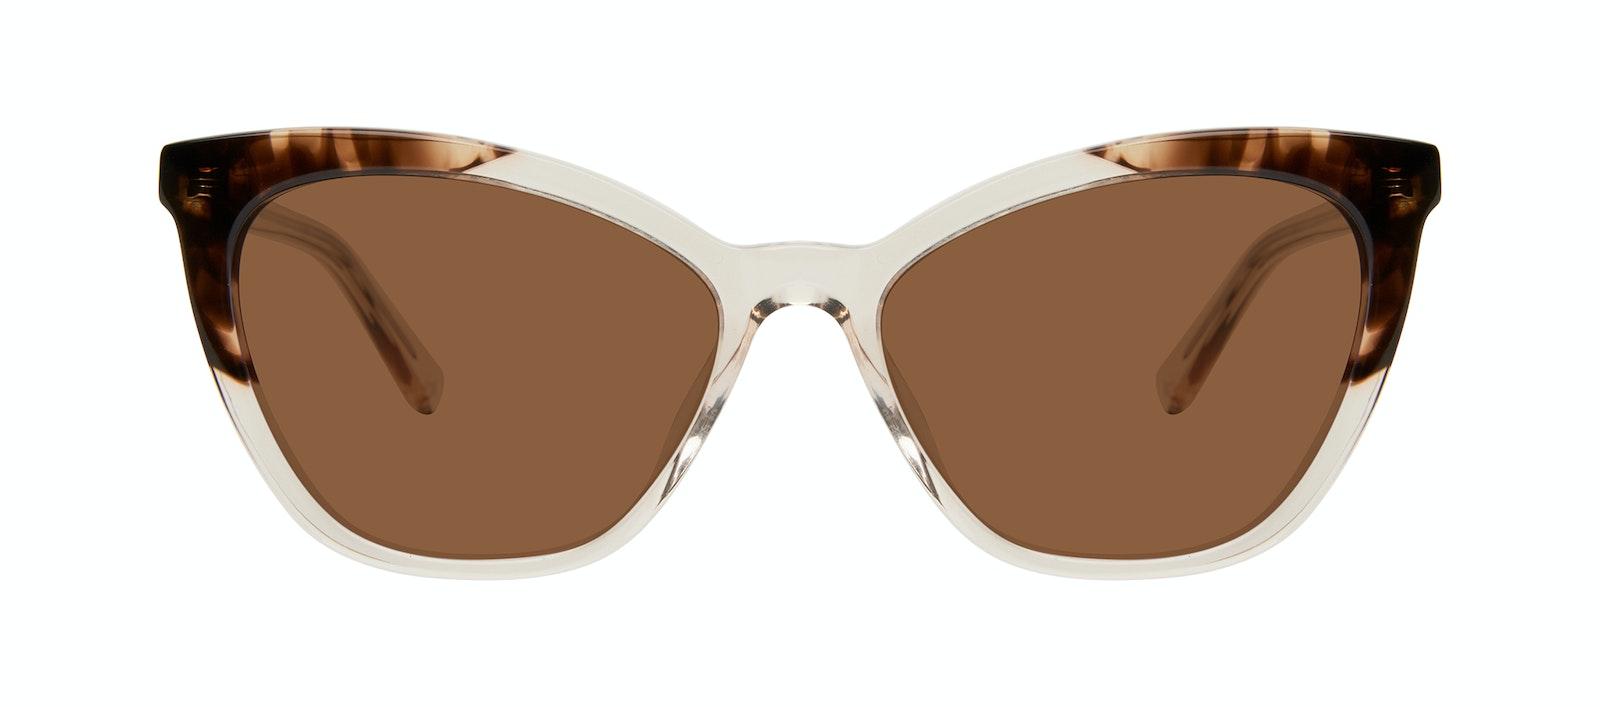 Affordable Fashion Glasses Cat Eye Sunglasses Women Elan Golden Tortoise Front